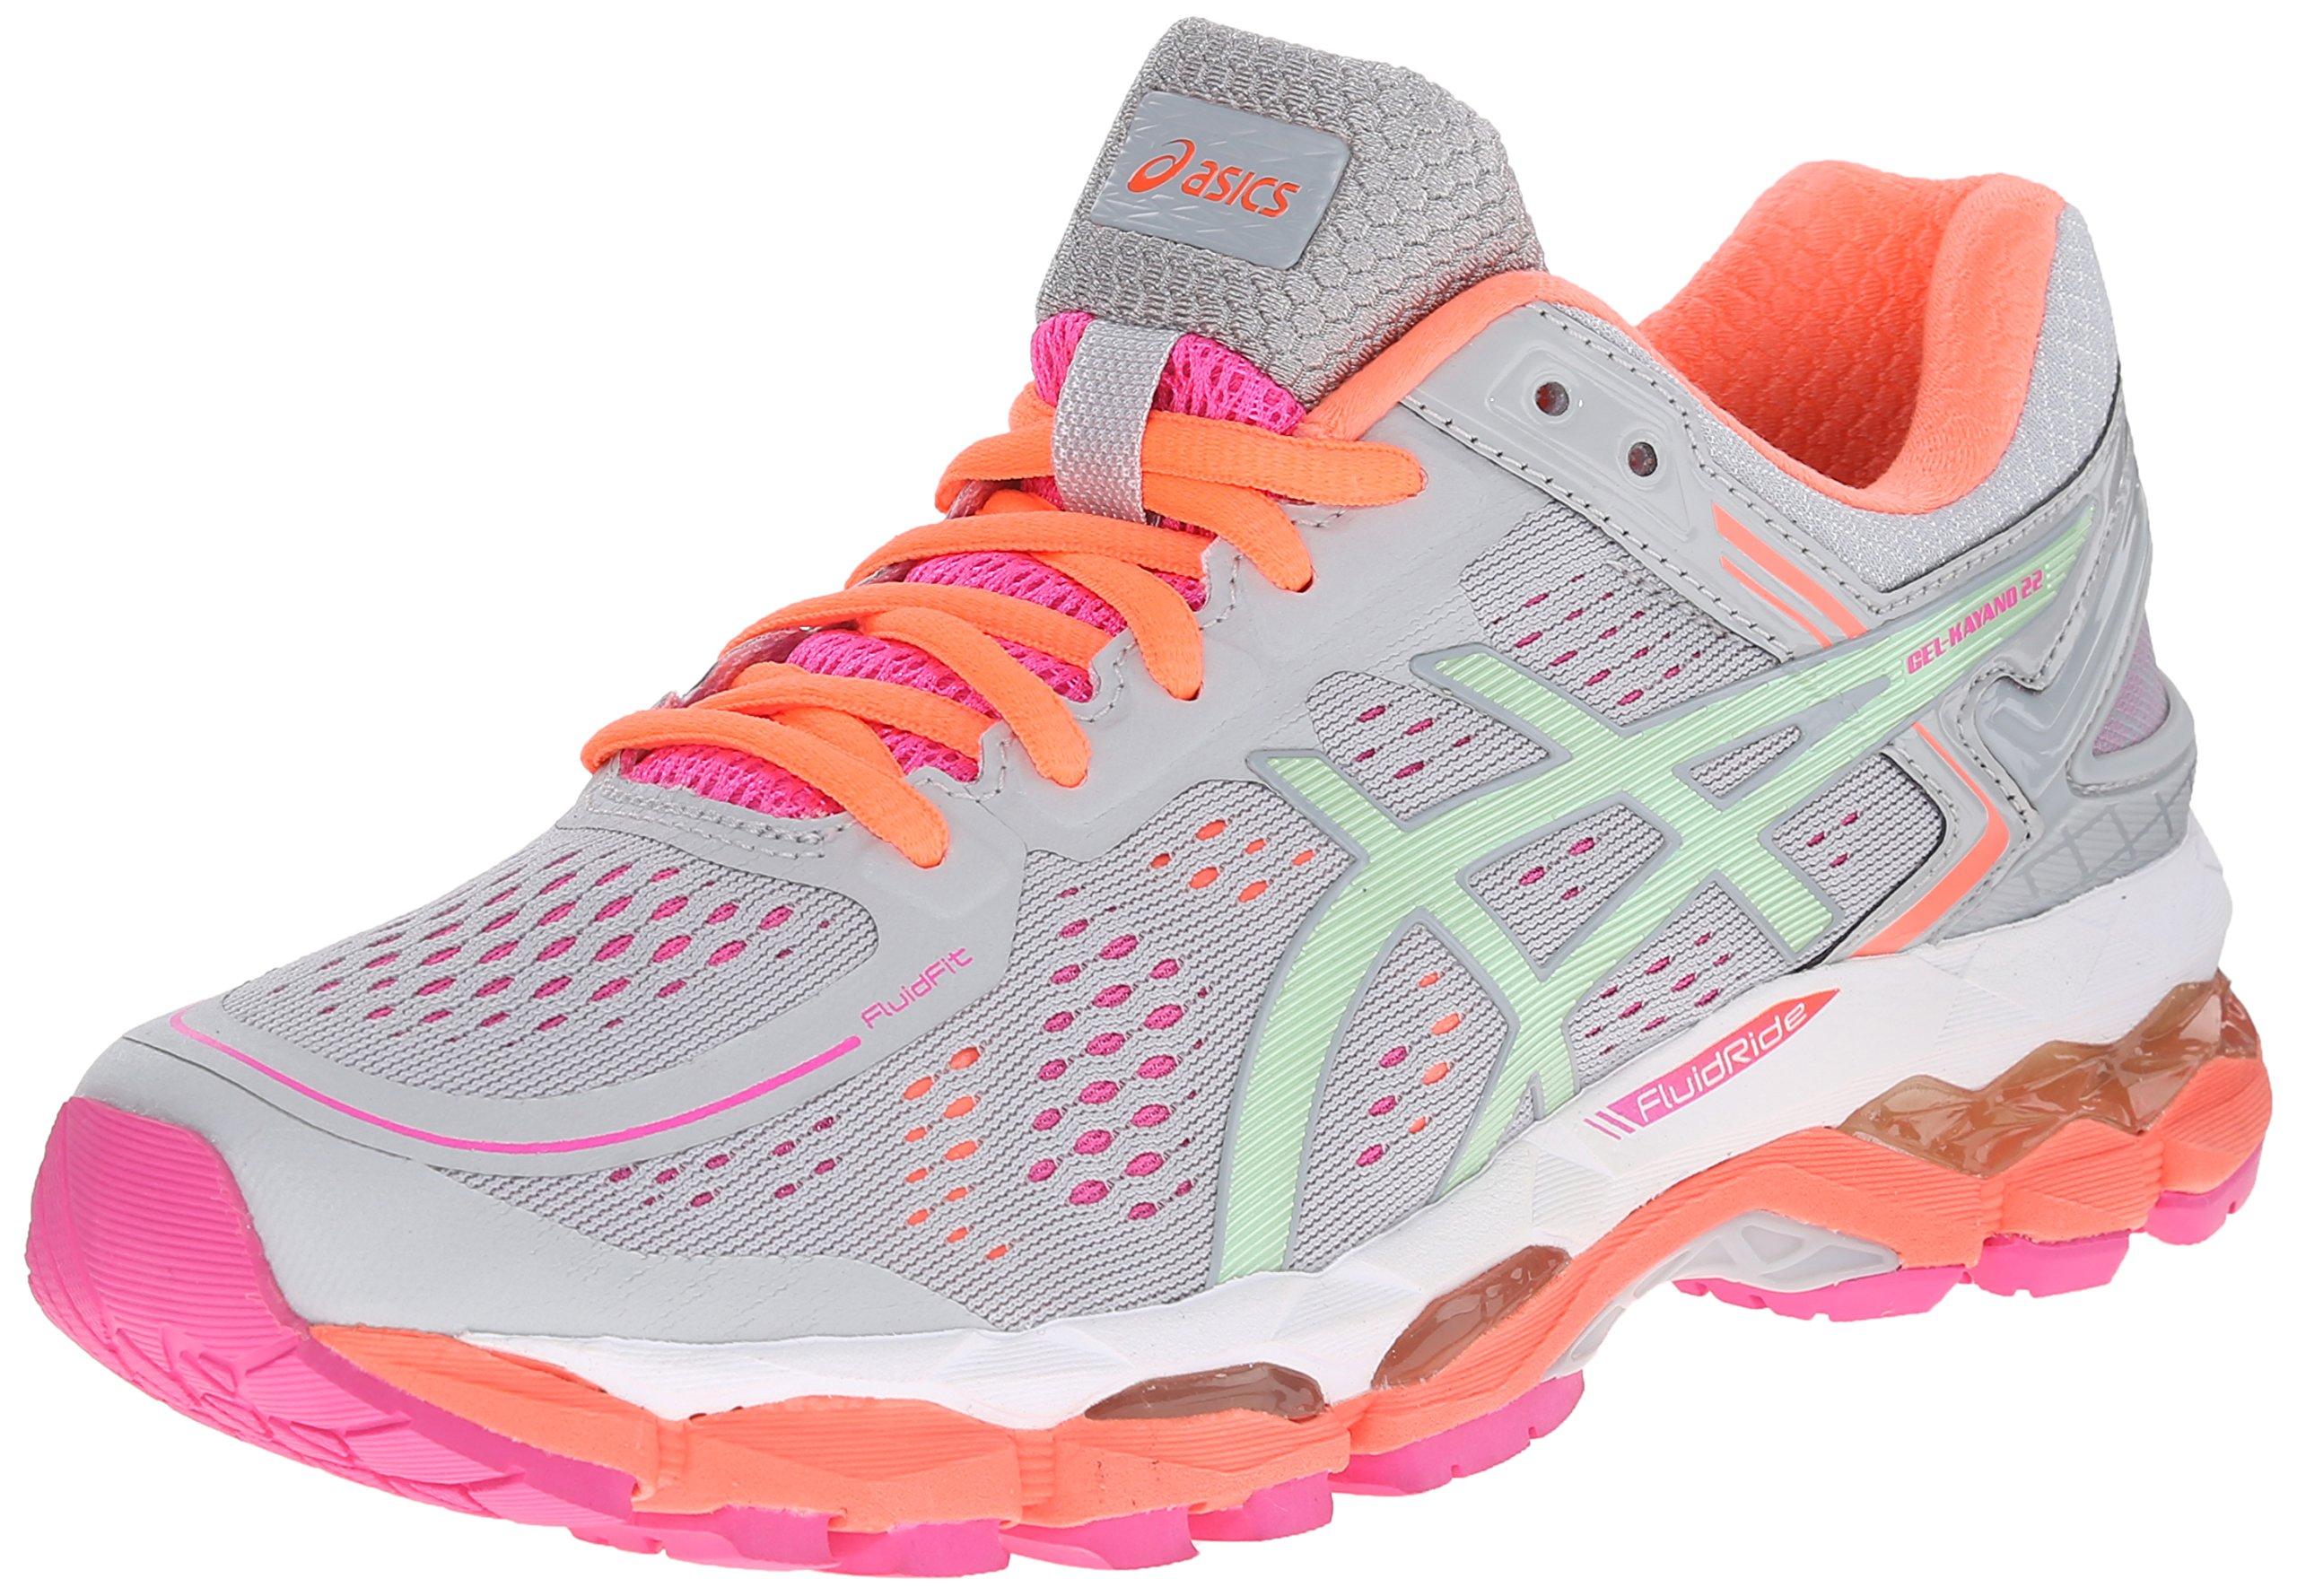 ASICS Women's Gel Kayano 22 Running Shoe, Silver Grey/Pistachio/Fiery Coral, 8.5 M US